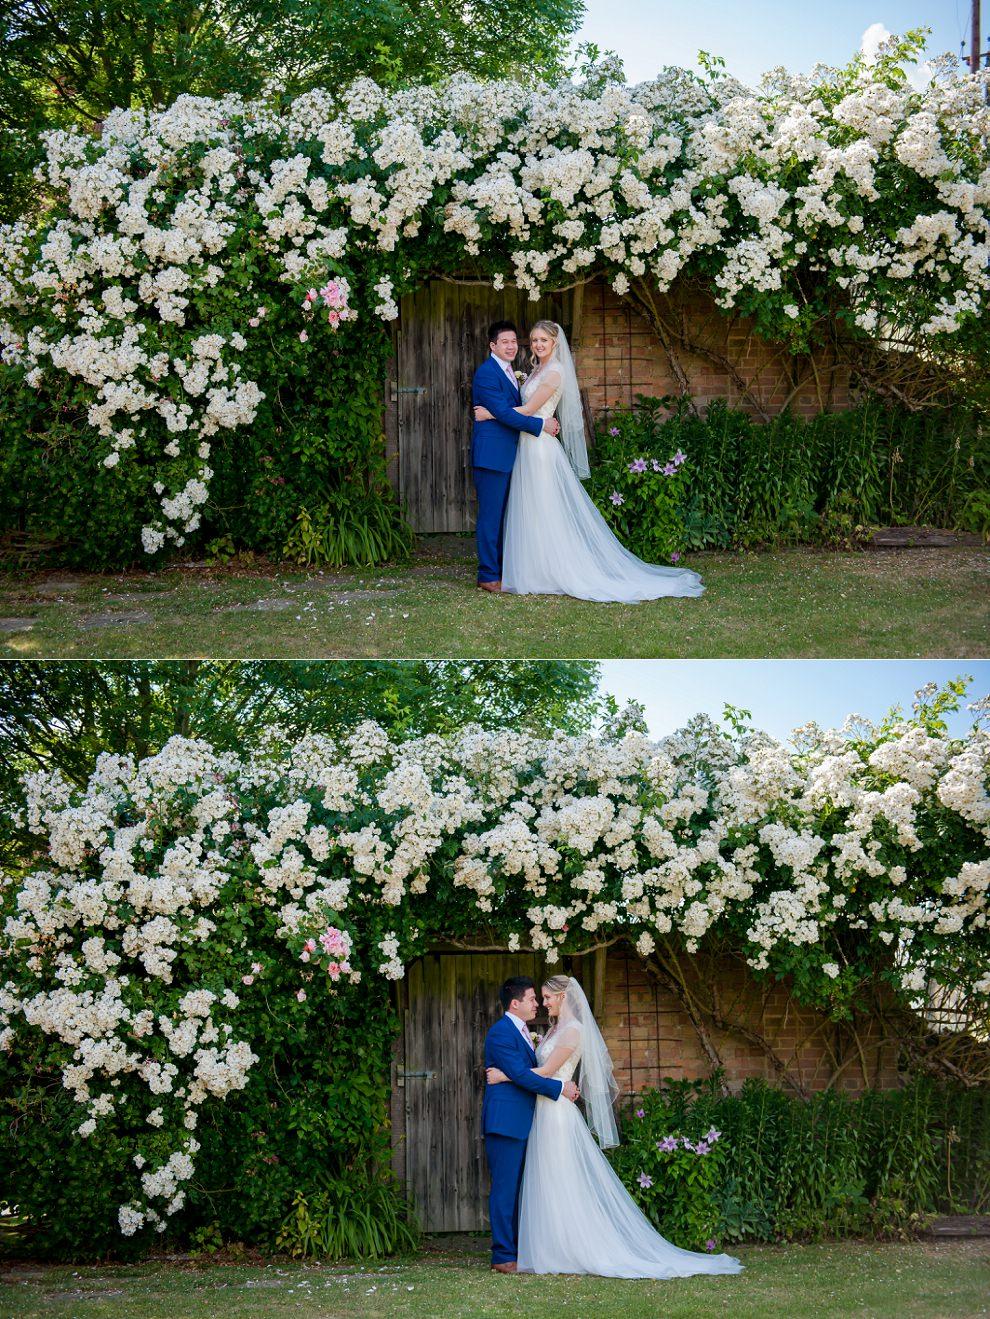 Moreves-Barn-Wedding-Amy-Ben-23